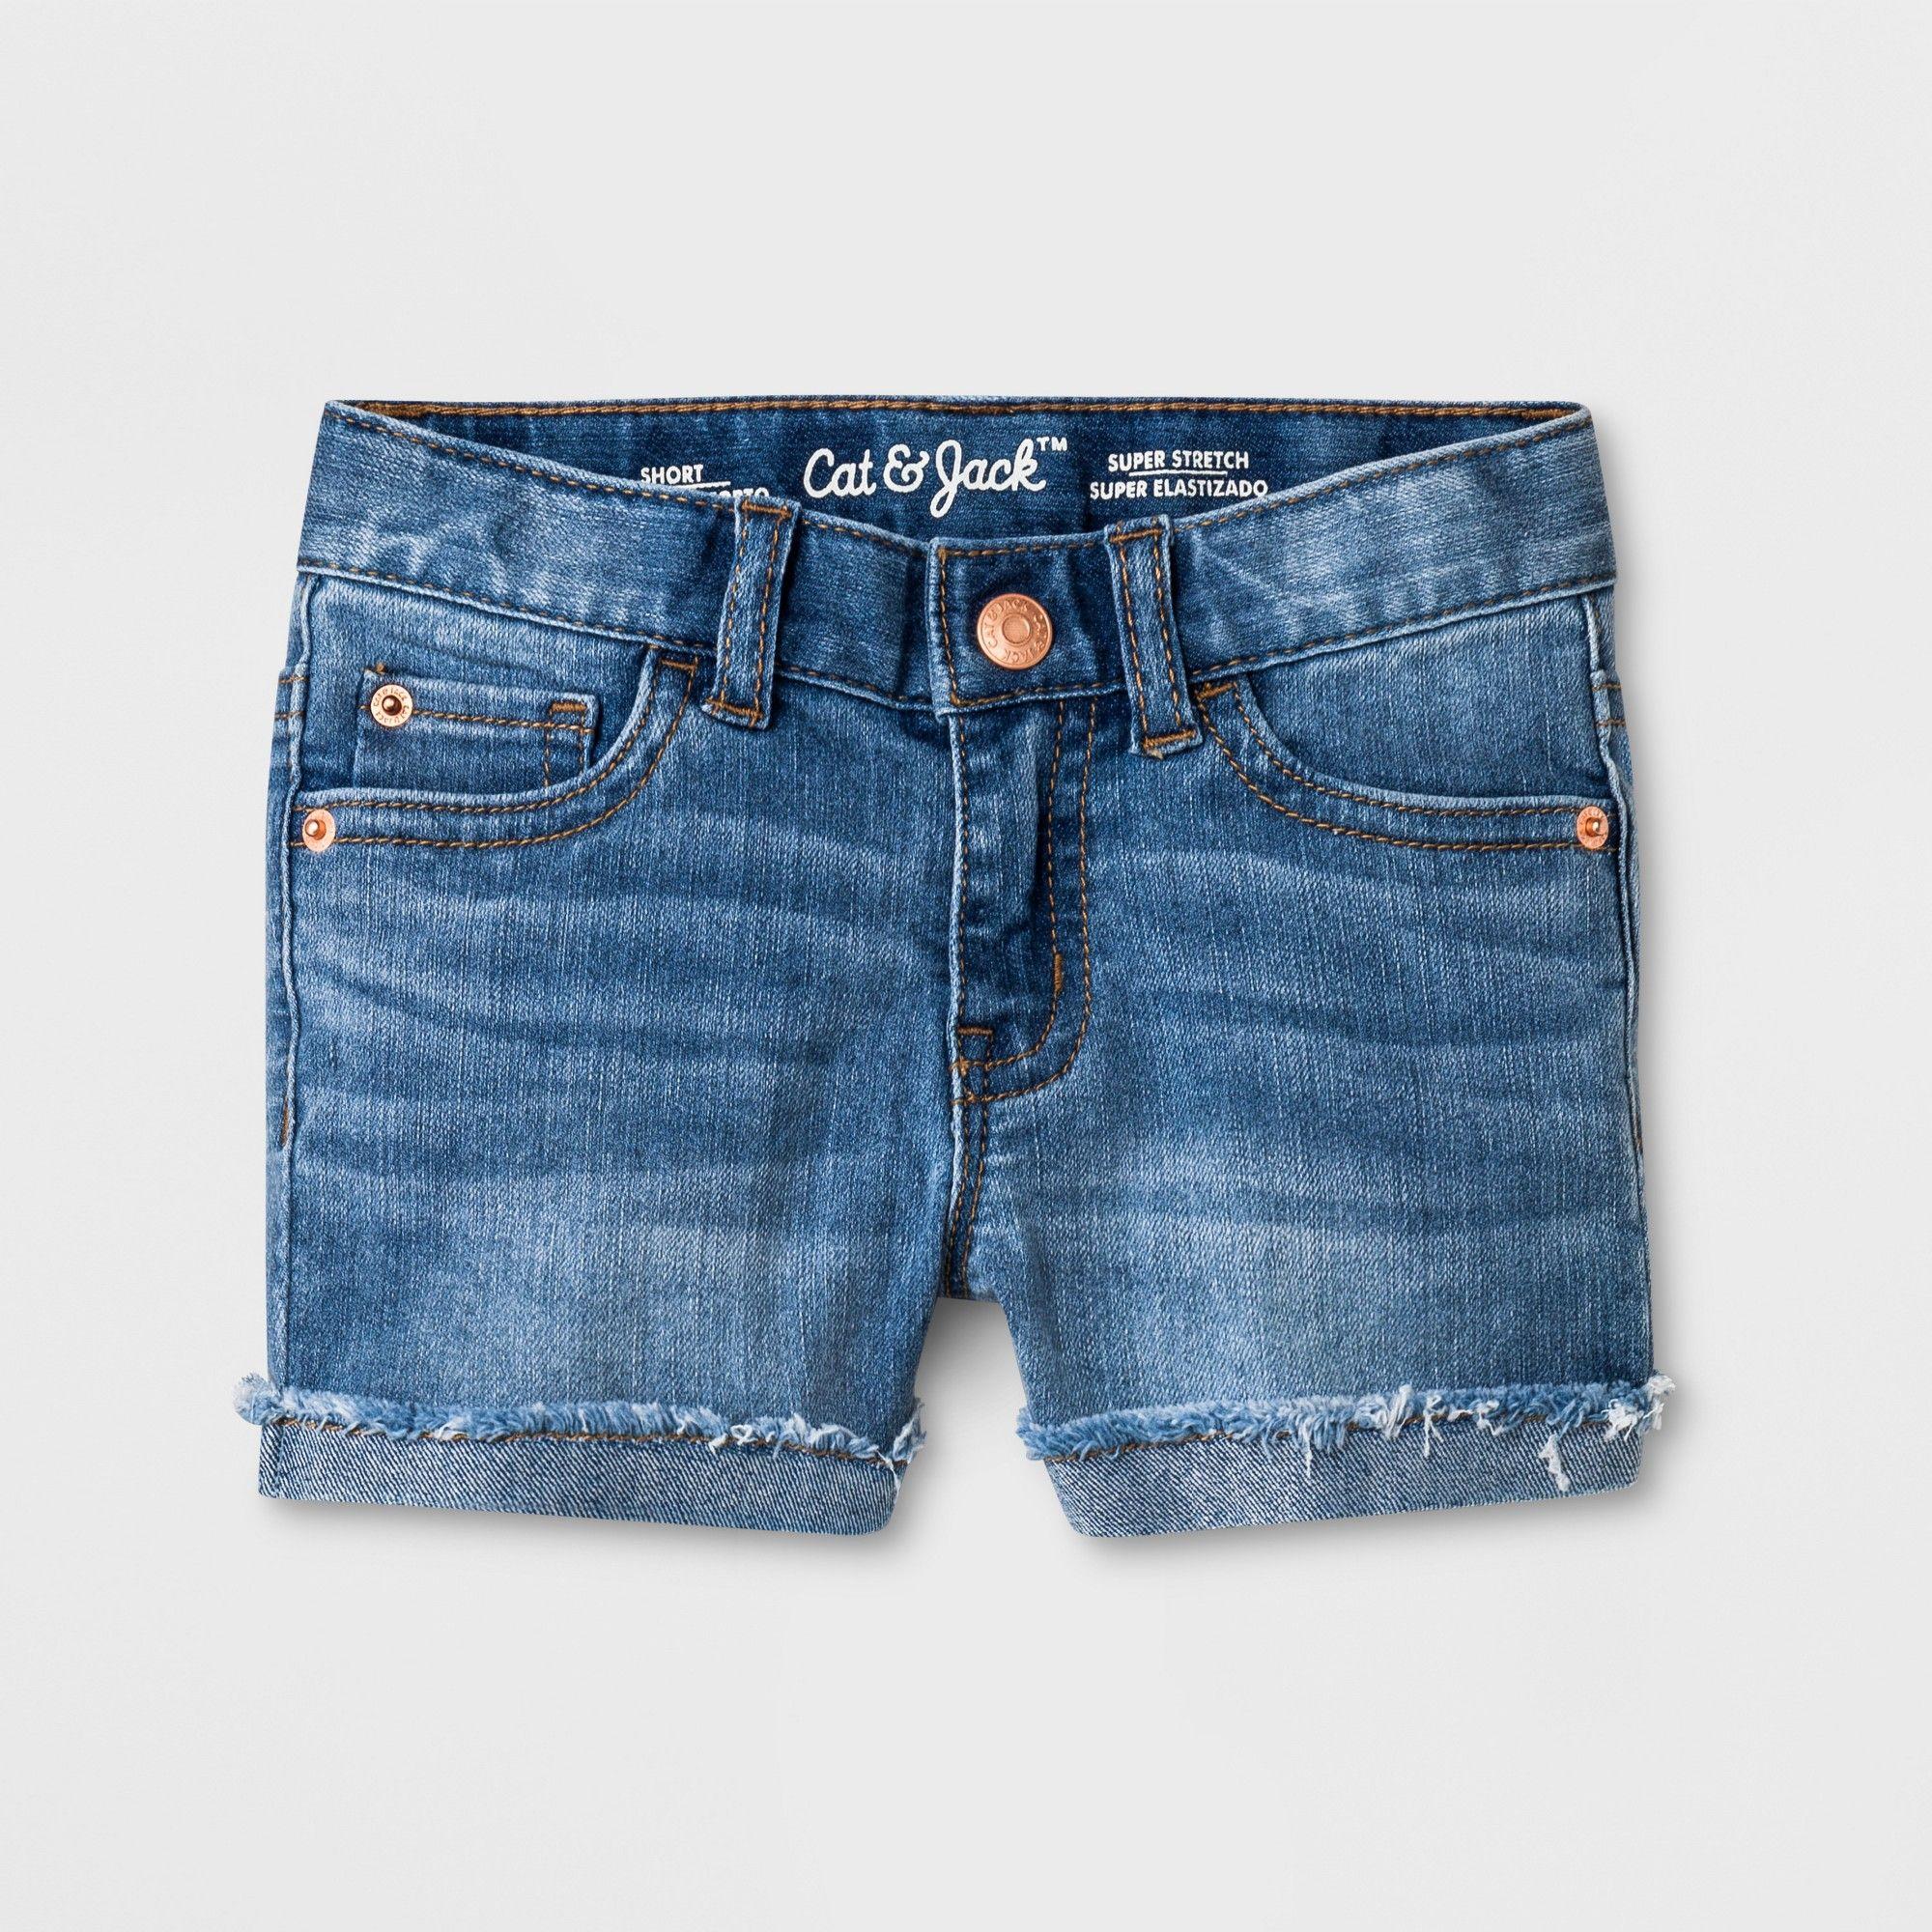 c17903959 Toddler Girls' Jean Shorts - Cat & Jack Medium Wash 3T, Blue in 2019 ...